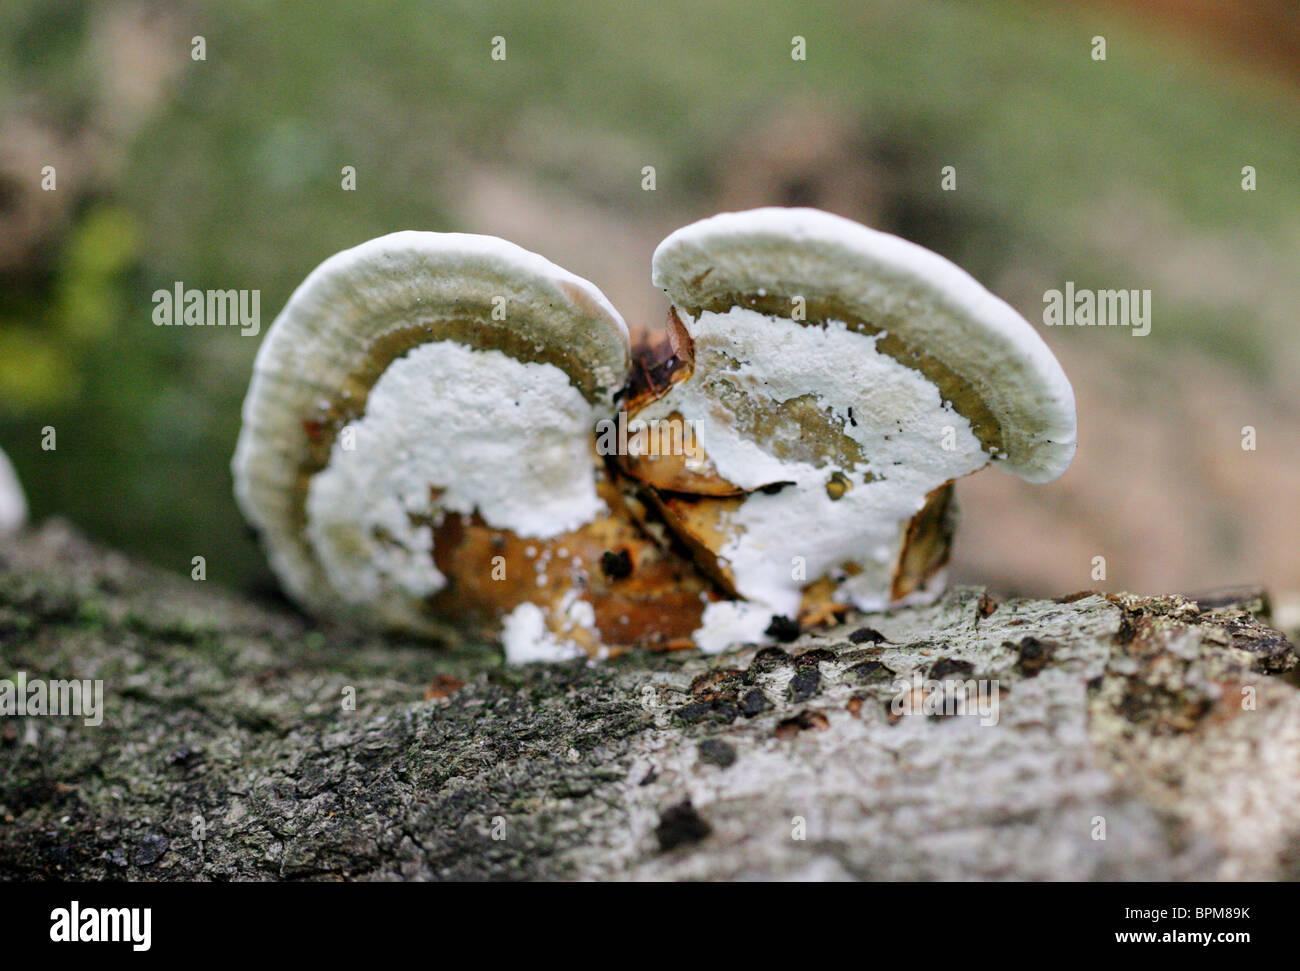 Bracket Fungus, Polyporaceae - Stock Image